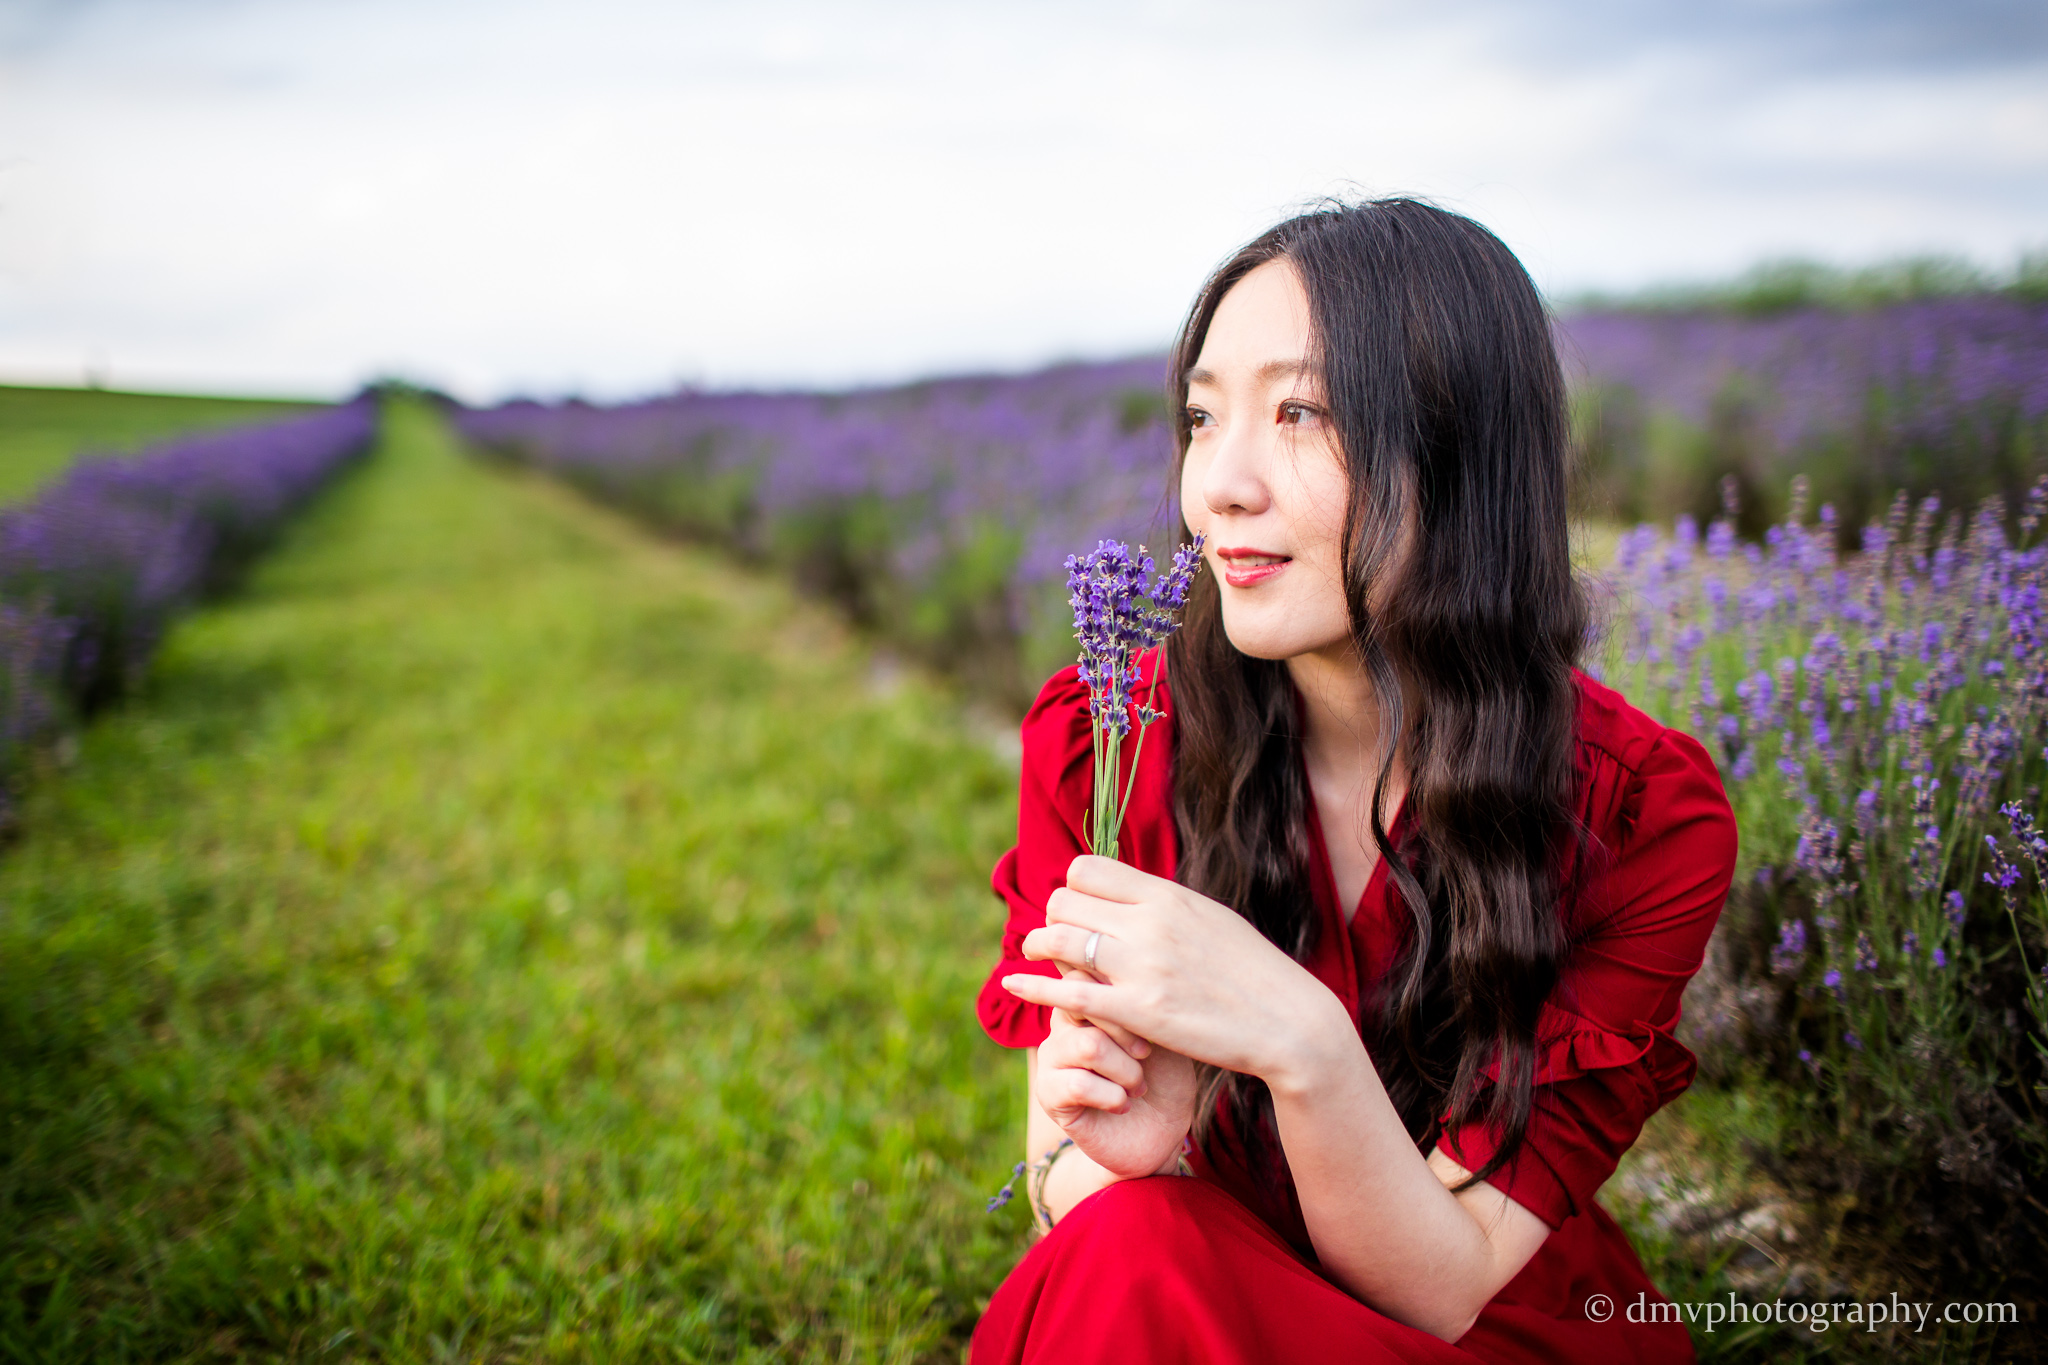 2016-06-24 - Zhu Xing - Lavender Field - 00037